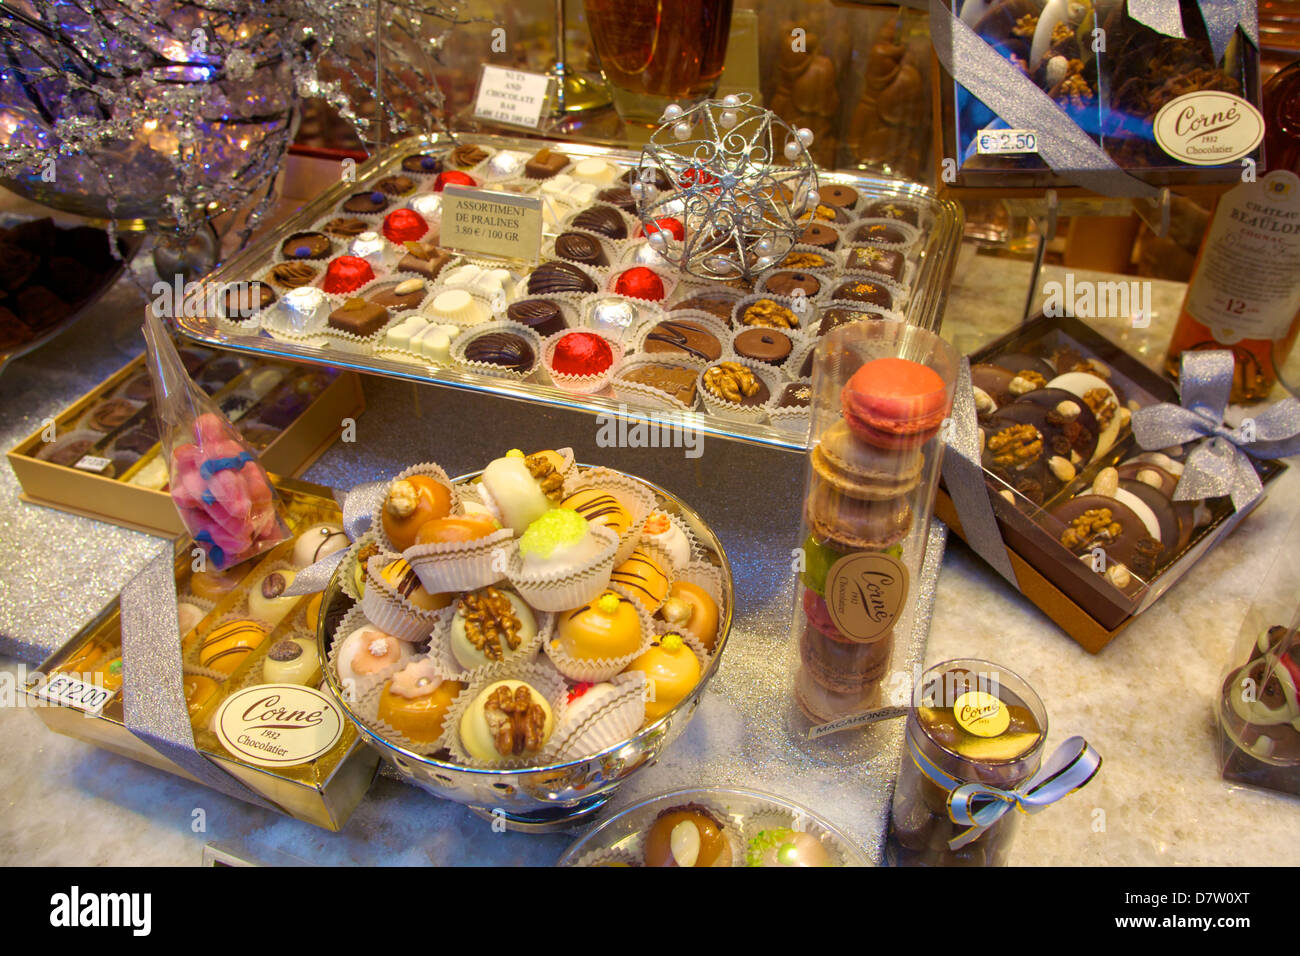 Sweet Shop Display, Brussels, Belgium - Stock Image